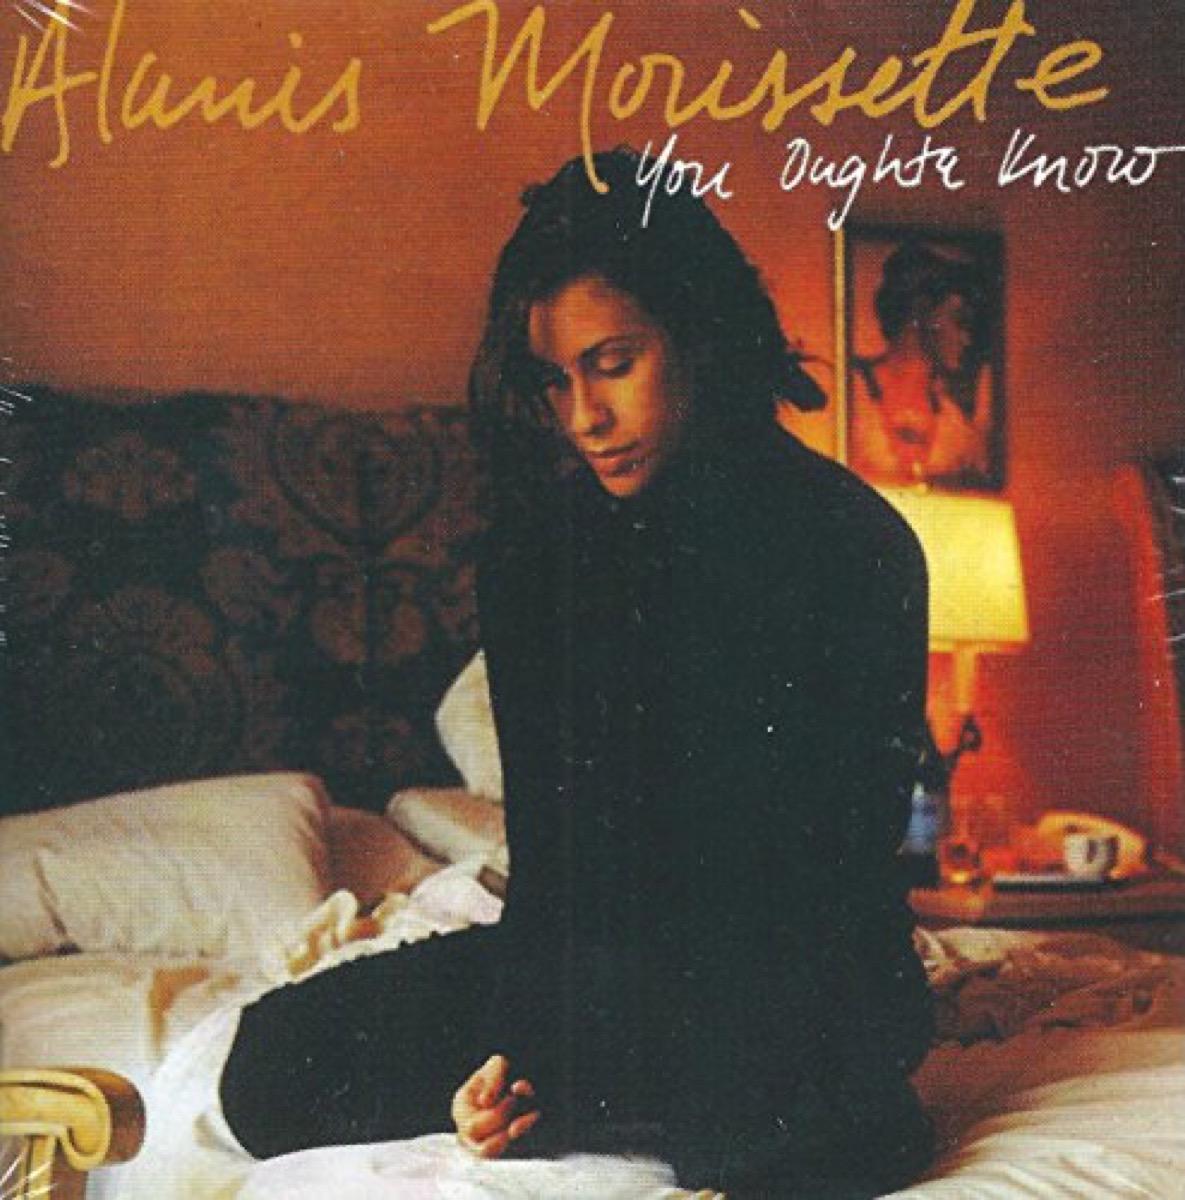 alanis morissette you oughta know cover art, best breakup songs